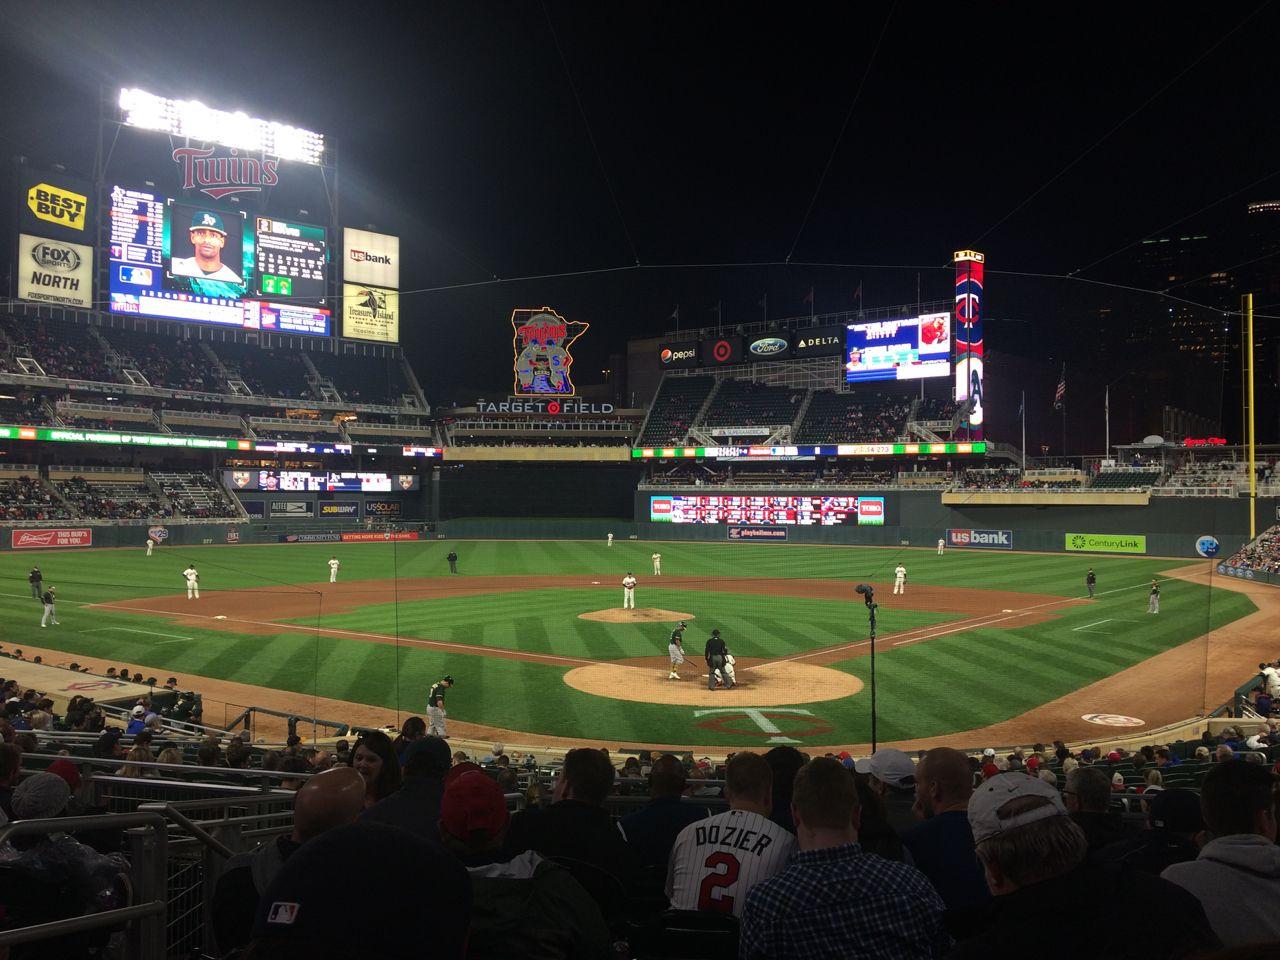 Twins Baseball Game May 2017 Twins Baseball Baseball Field Baseball